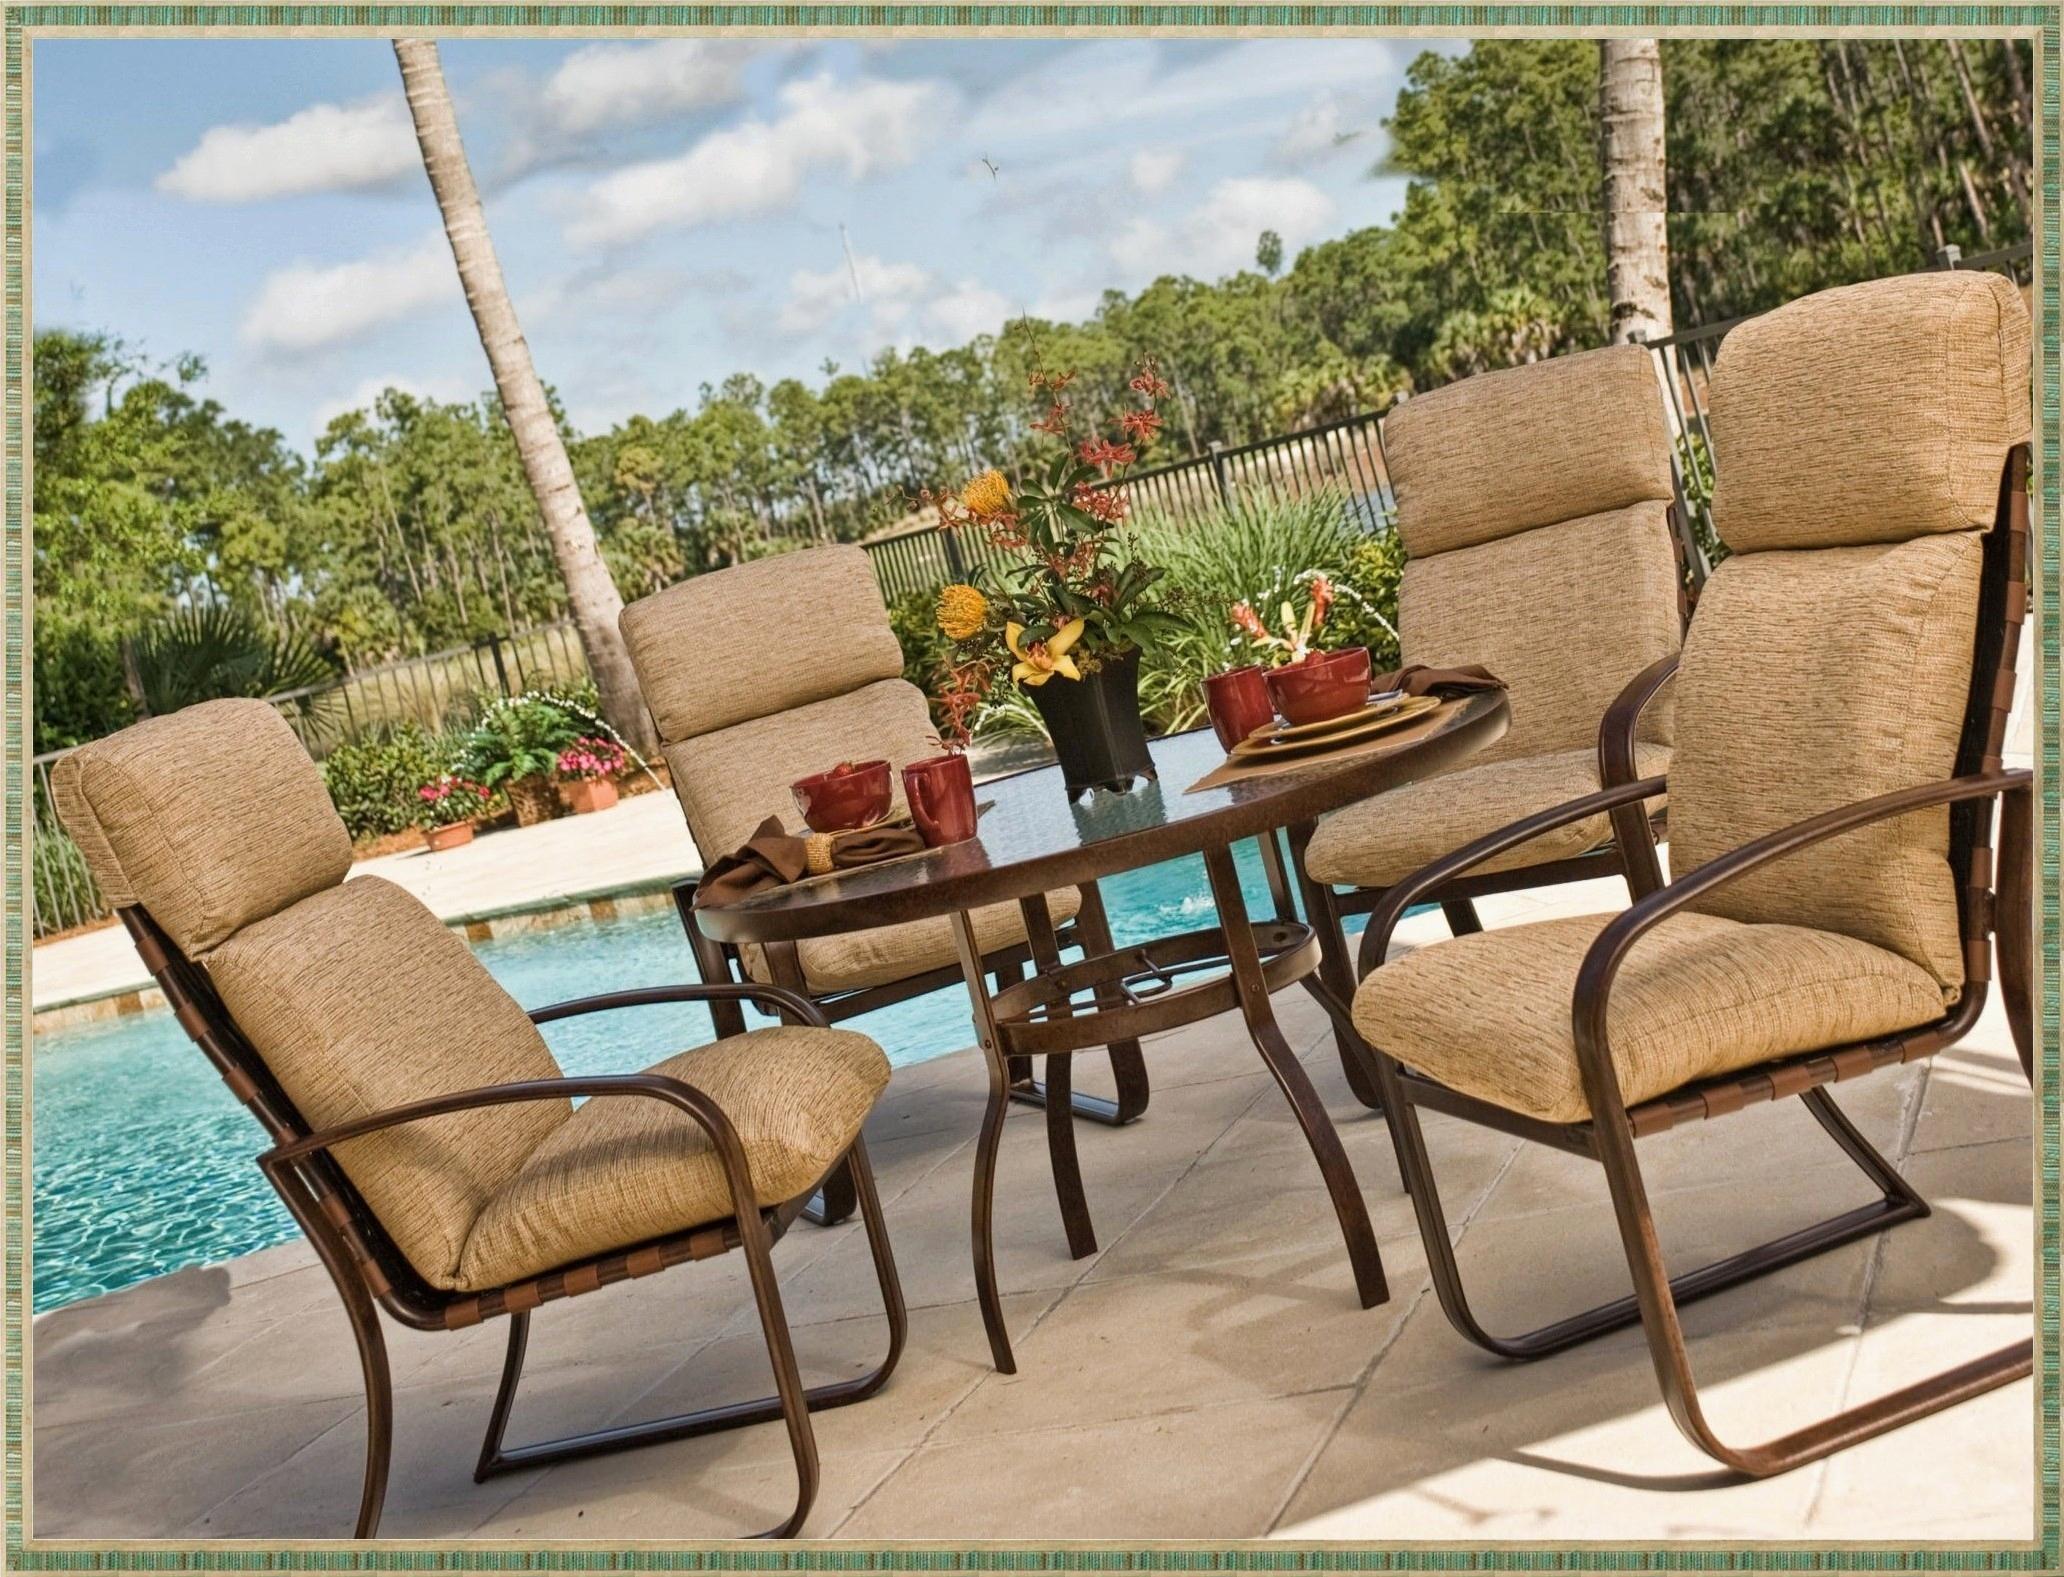 Outdoor Patio Furniture Wichita Ks Ideas In Measurements 2064 X 1577